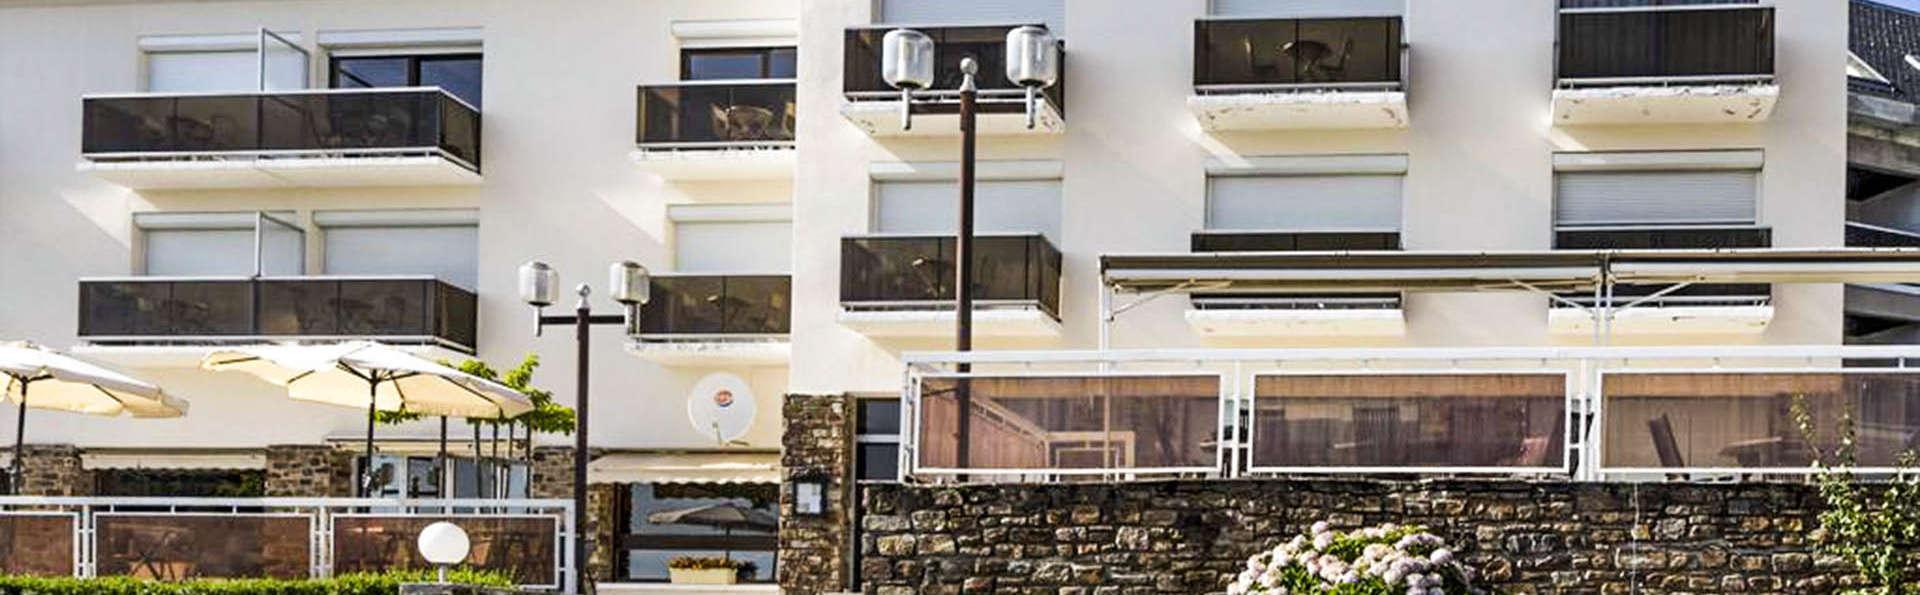 Segala Plein Ciel - Facade_Hotel_01.jpg